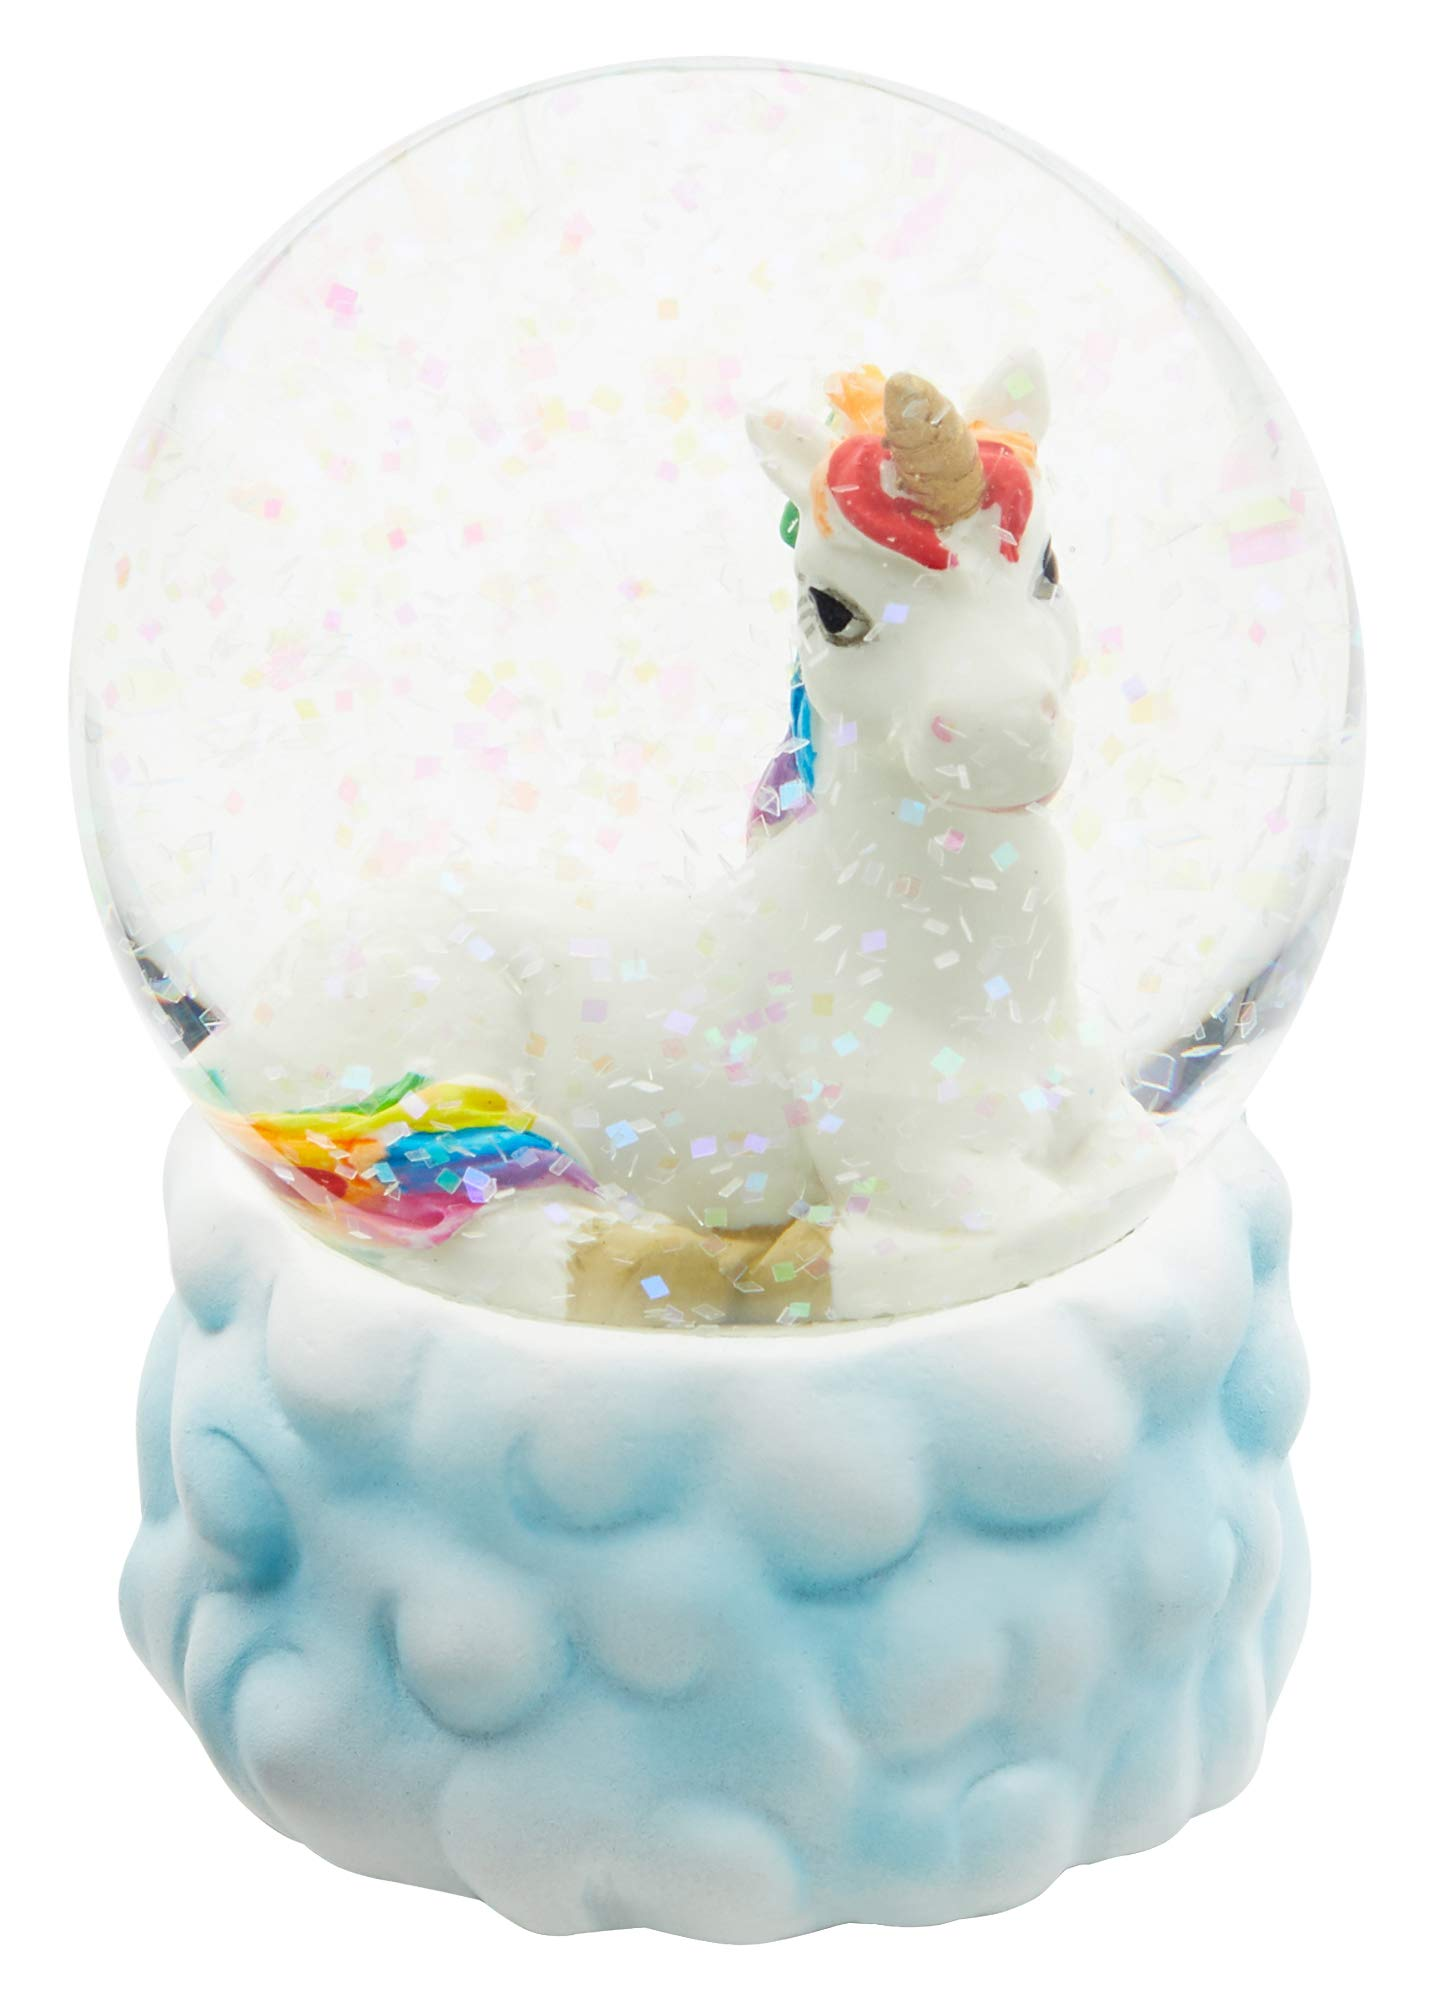 Cepewa White Unicorn with Rainbow Main and Tail Water Snow Globe with White Cloud Base, 65mm by Cepewa